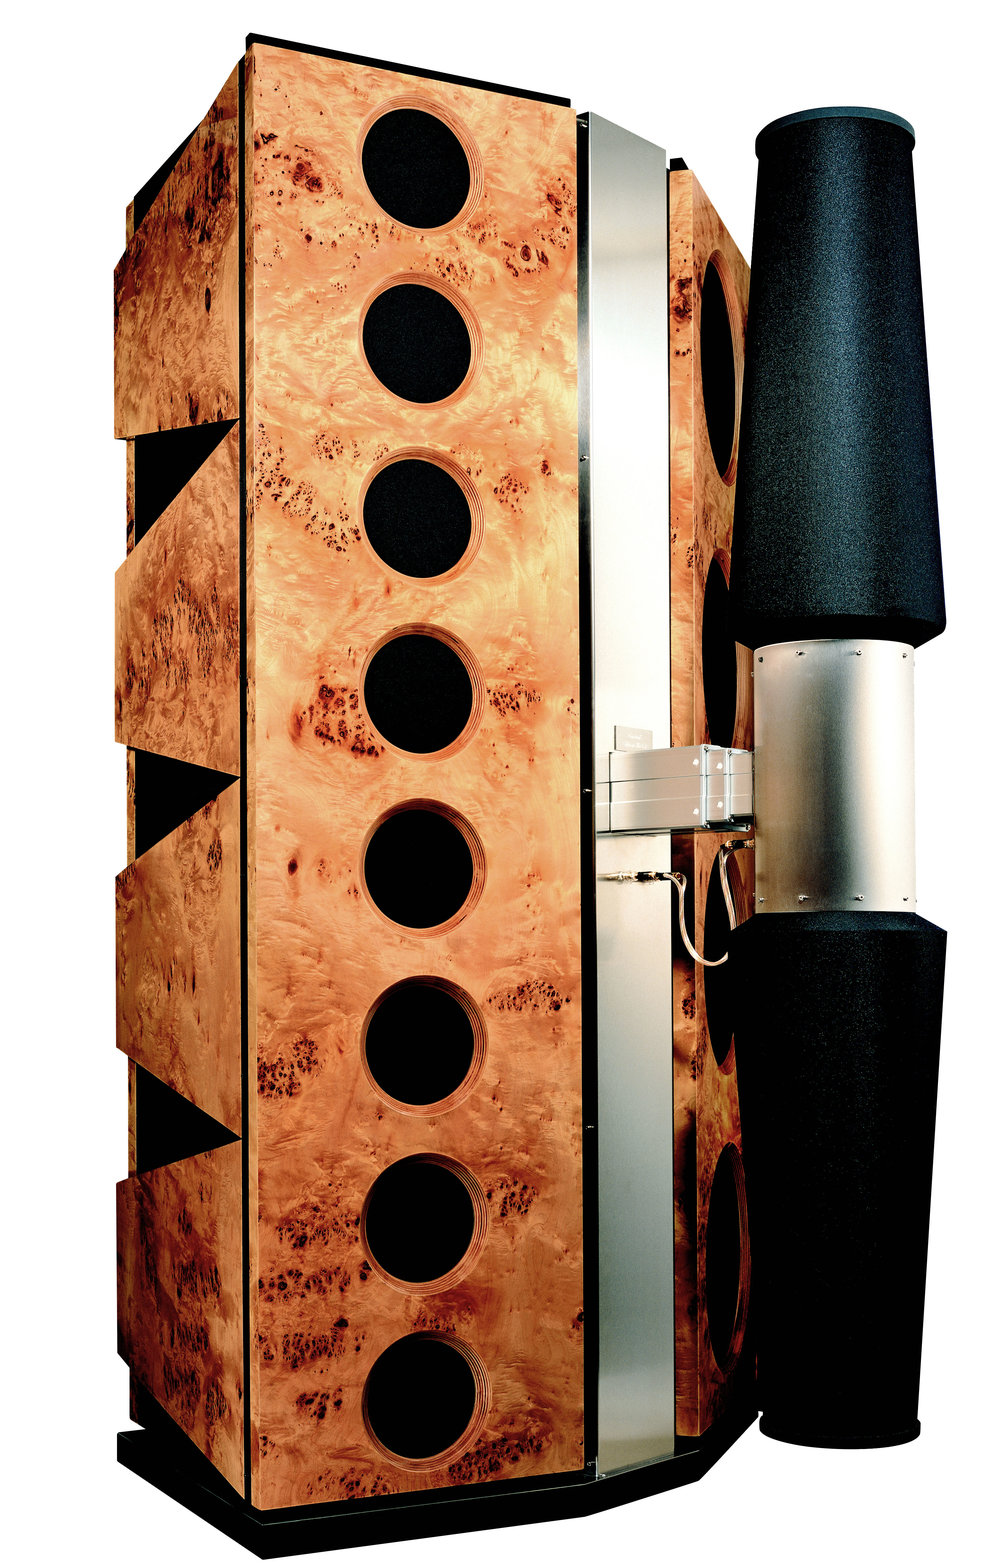 German Physiks Gaudi MK II loudspeaker